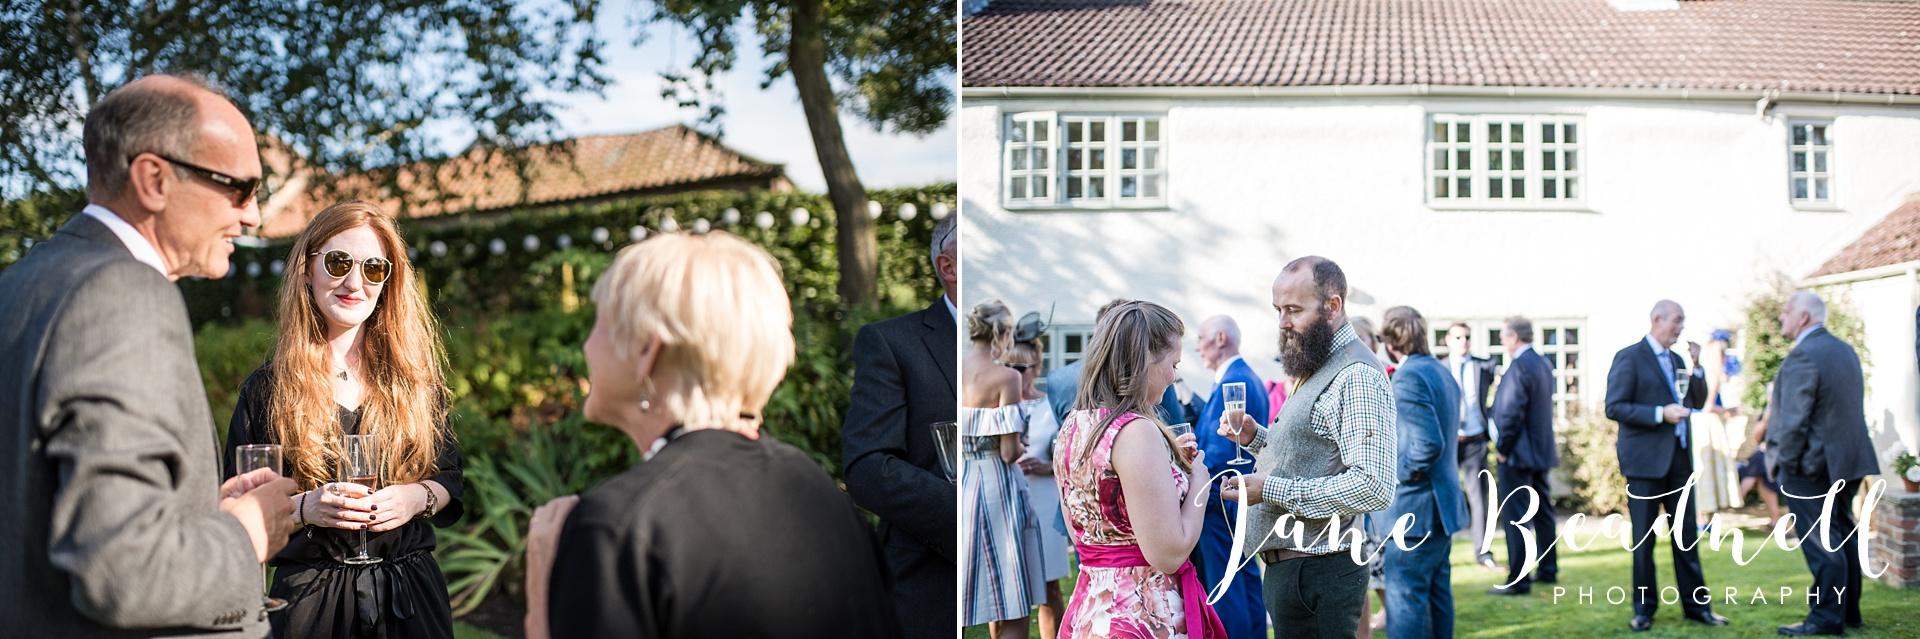 fine-art-wedding-photographer-jane-beadnell-yorkshire-wedding-photographer_0081